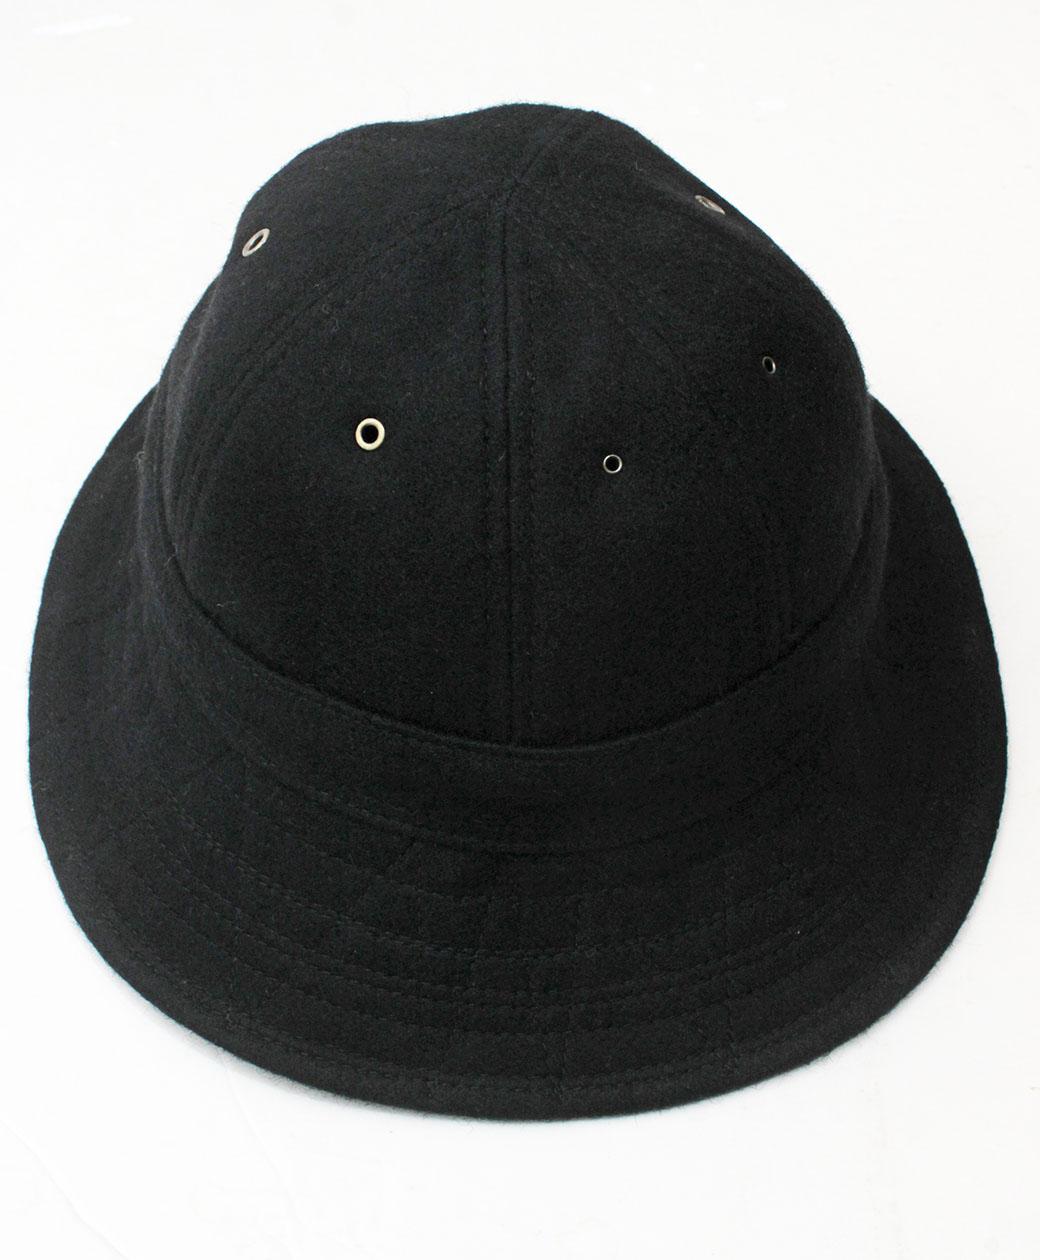 BlueBooks Co. Random Military Hat(Melton BLK)